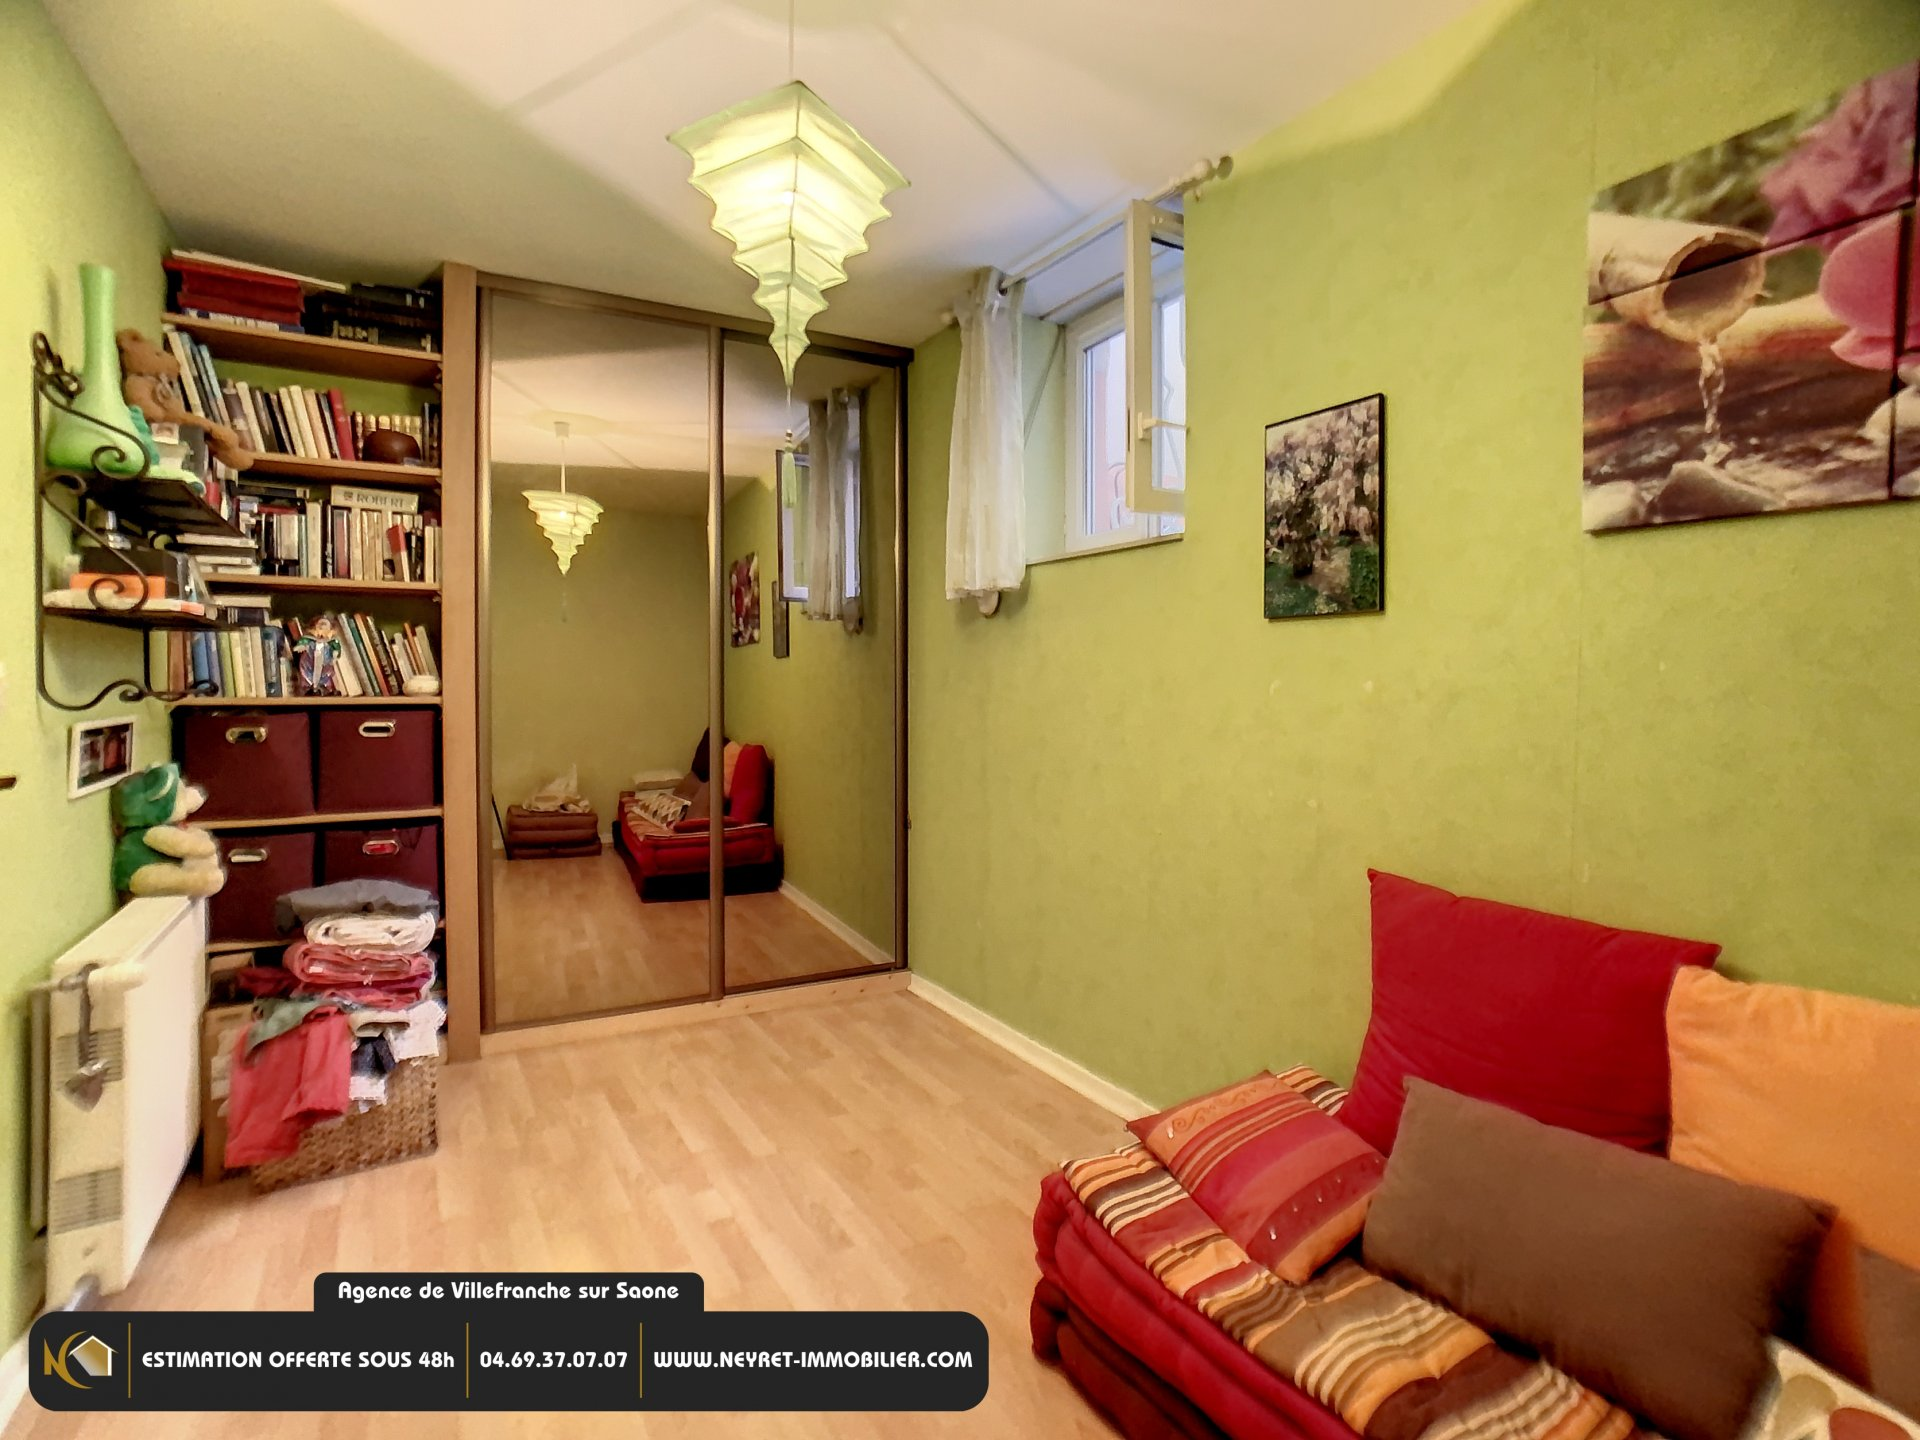 Appartement Duplex - Hyper centre